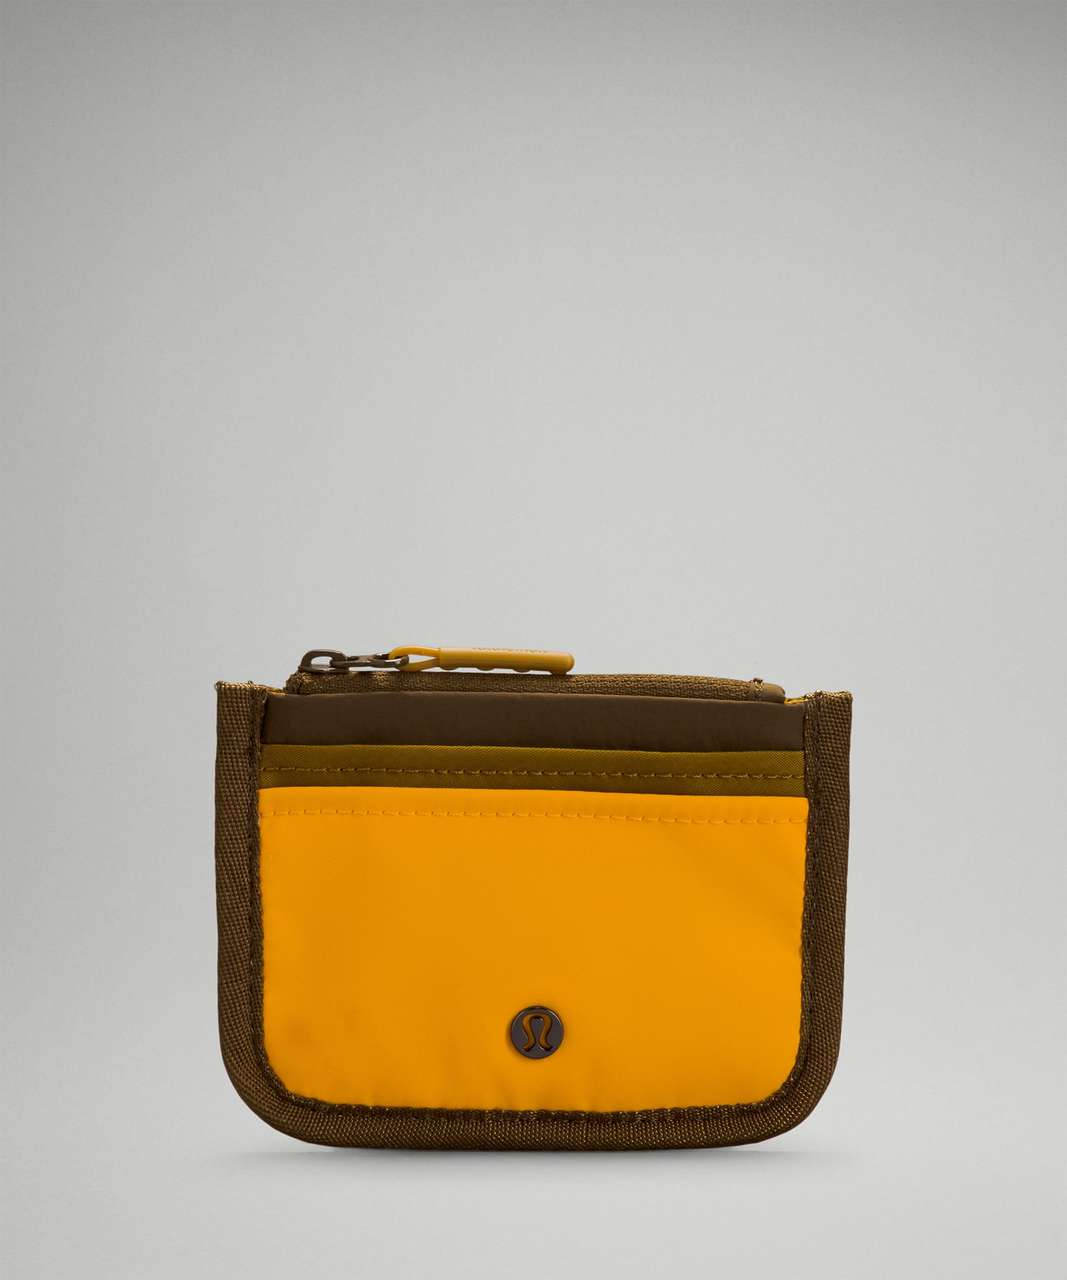 Lululemon True Identity Card Case - Clementine / Gold Spice / Deep Artifact